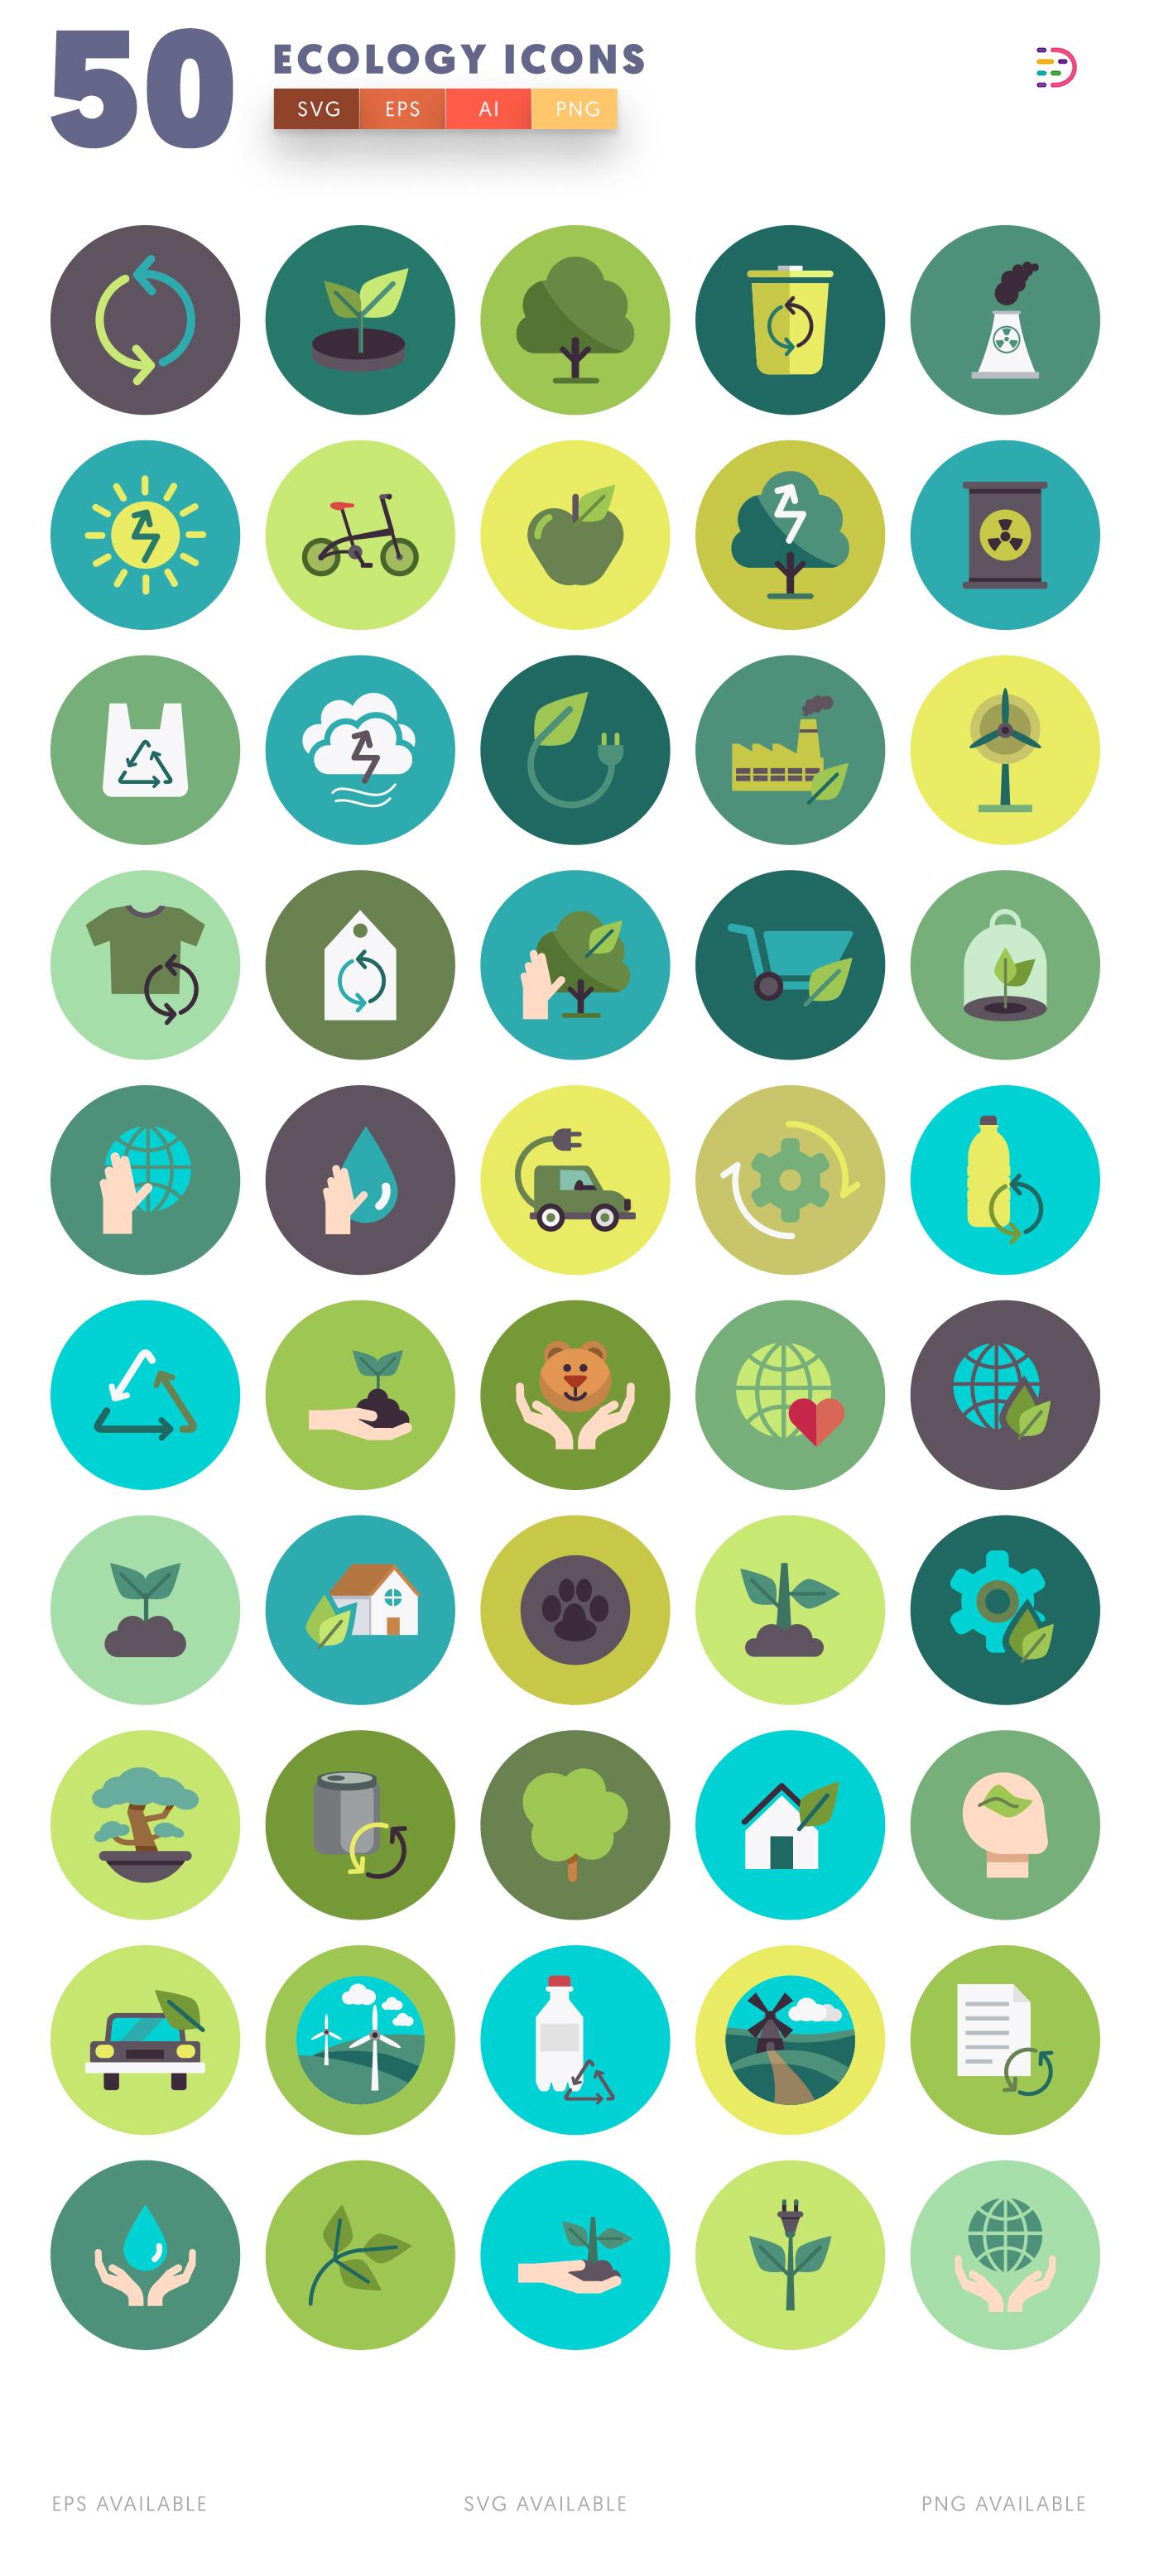 Design ready 50 Ecology Icons